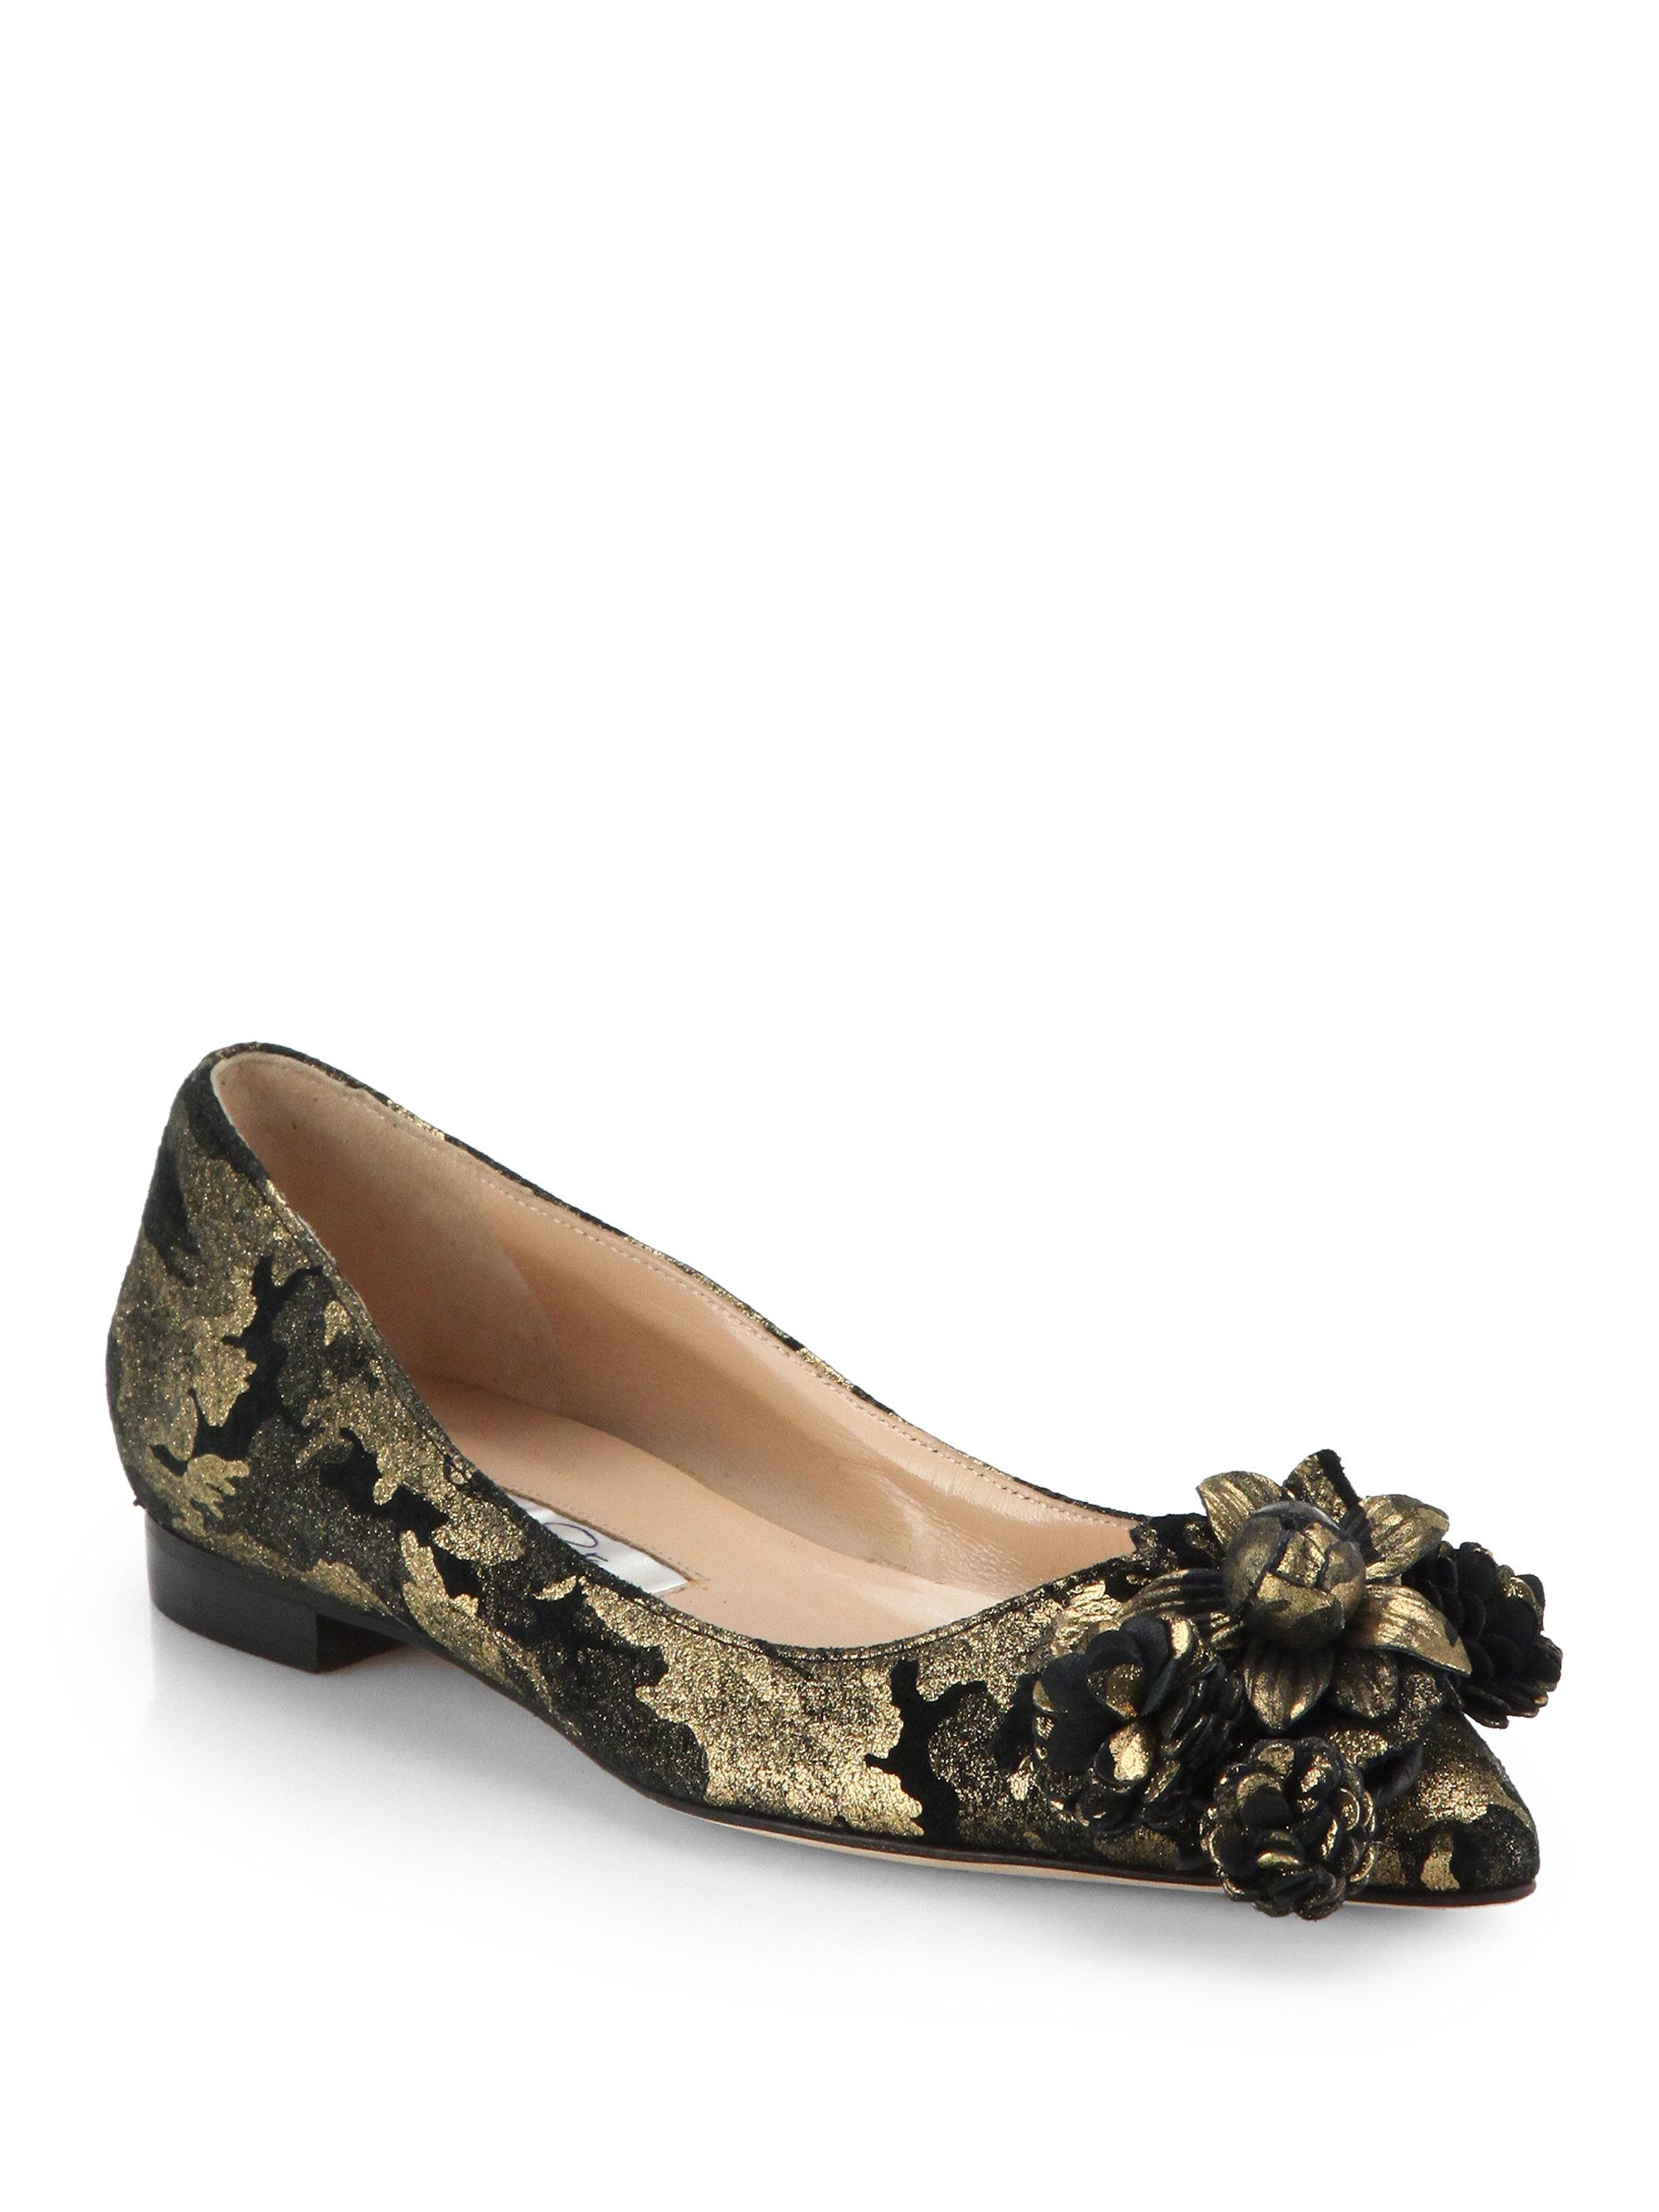 discount fashionable Oscar de la Renta Metallic Bow Mesh Flats sale best wholesale GifgBu97